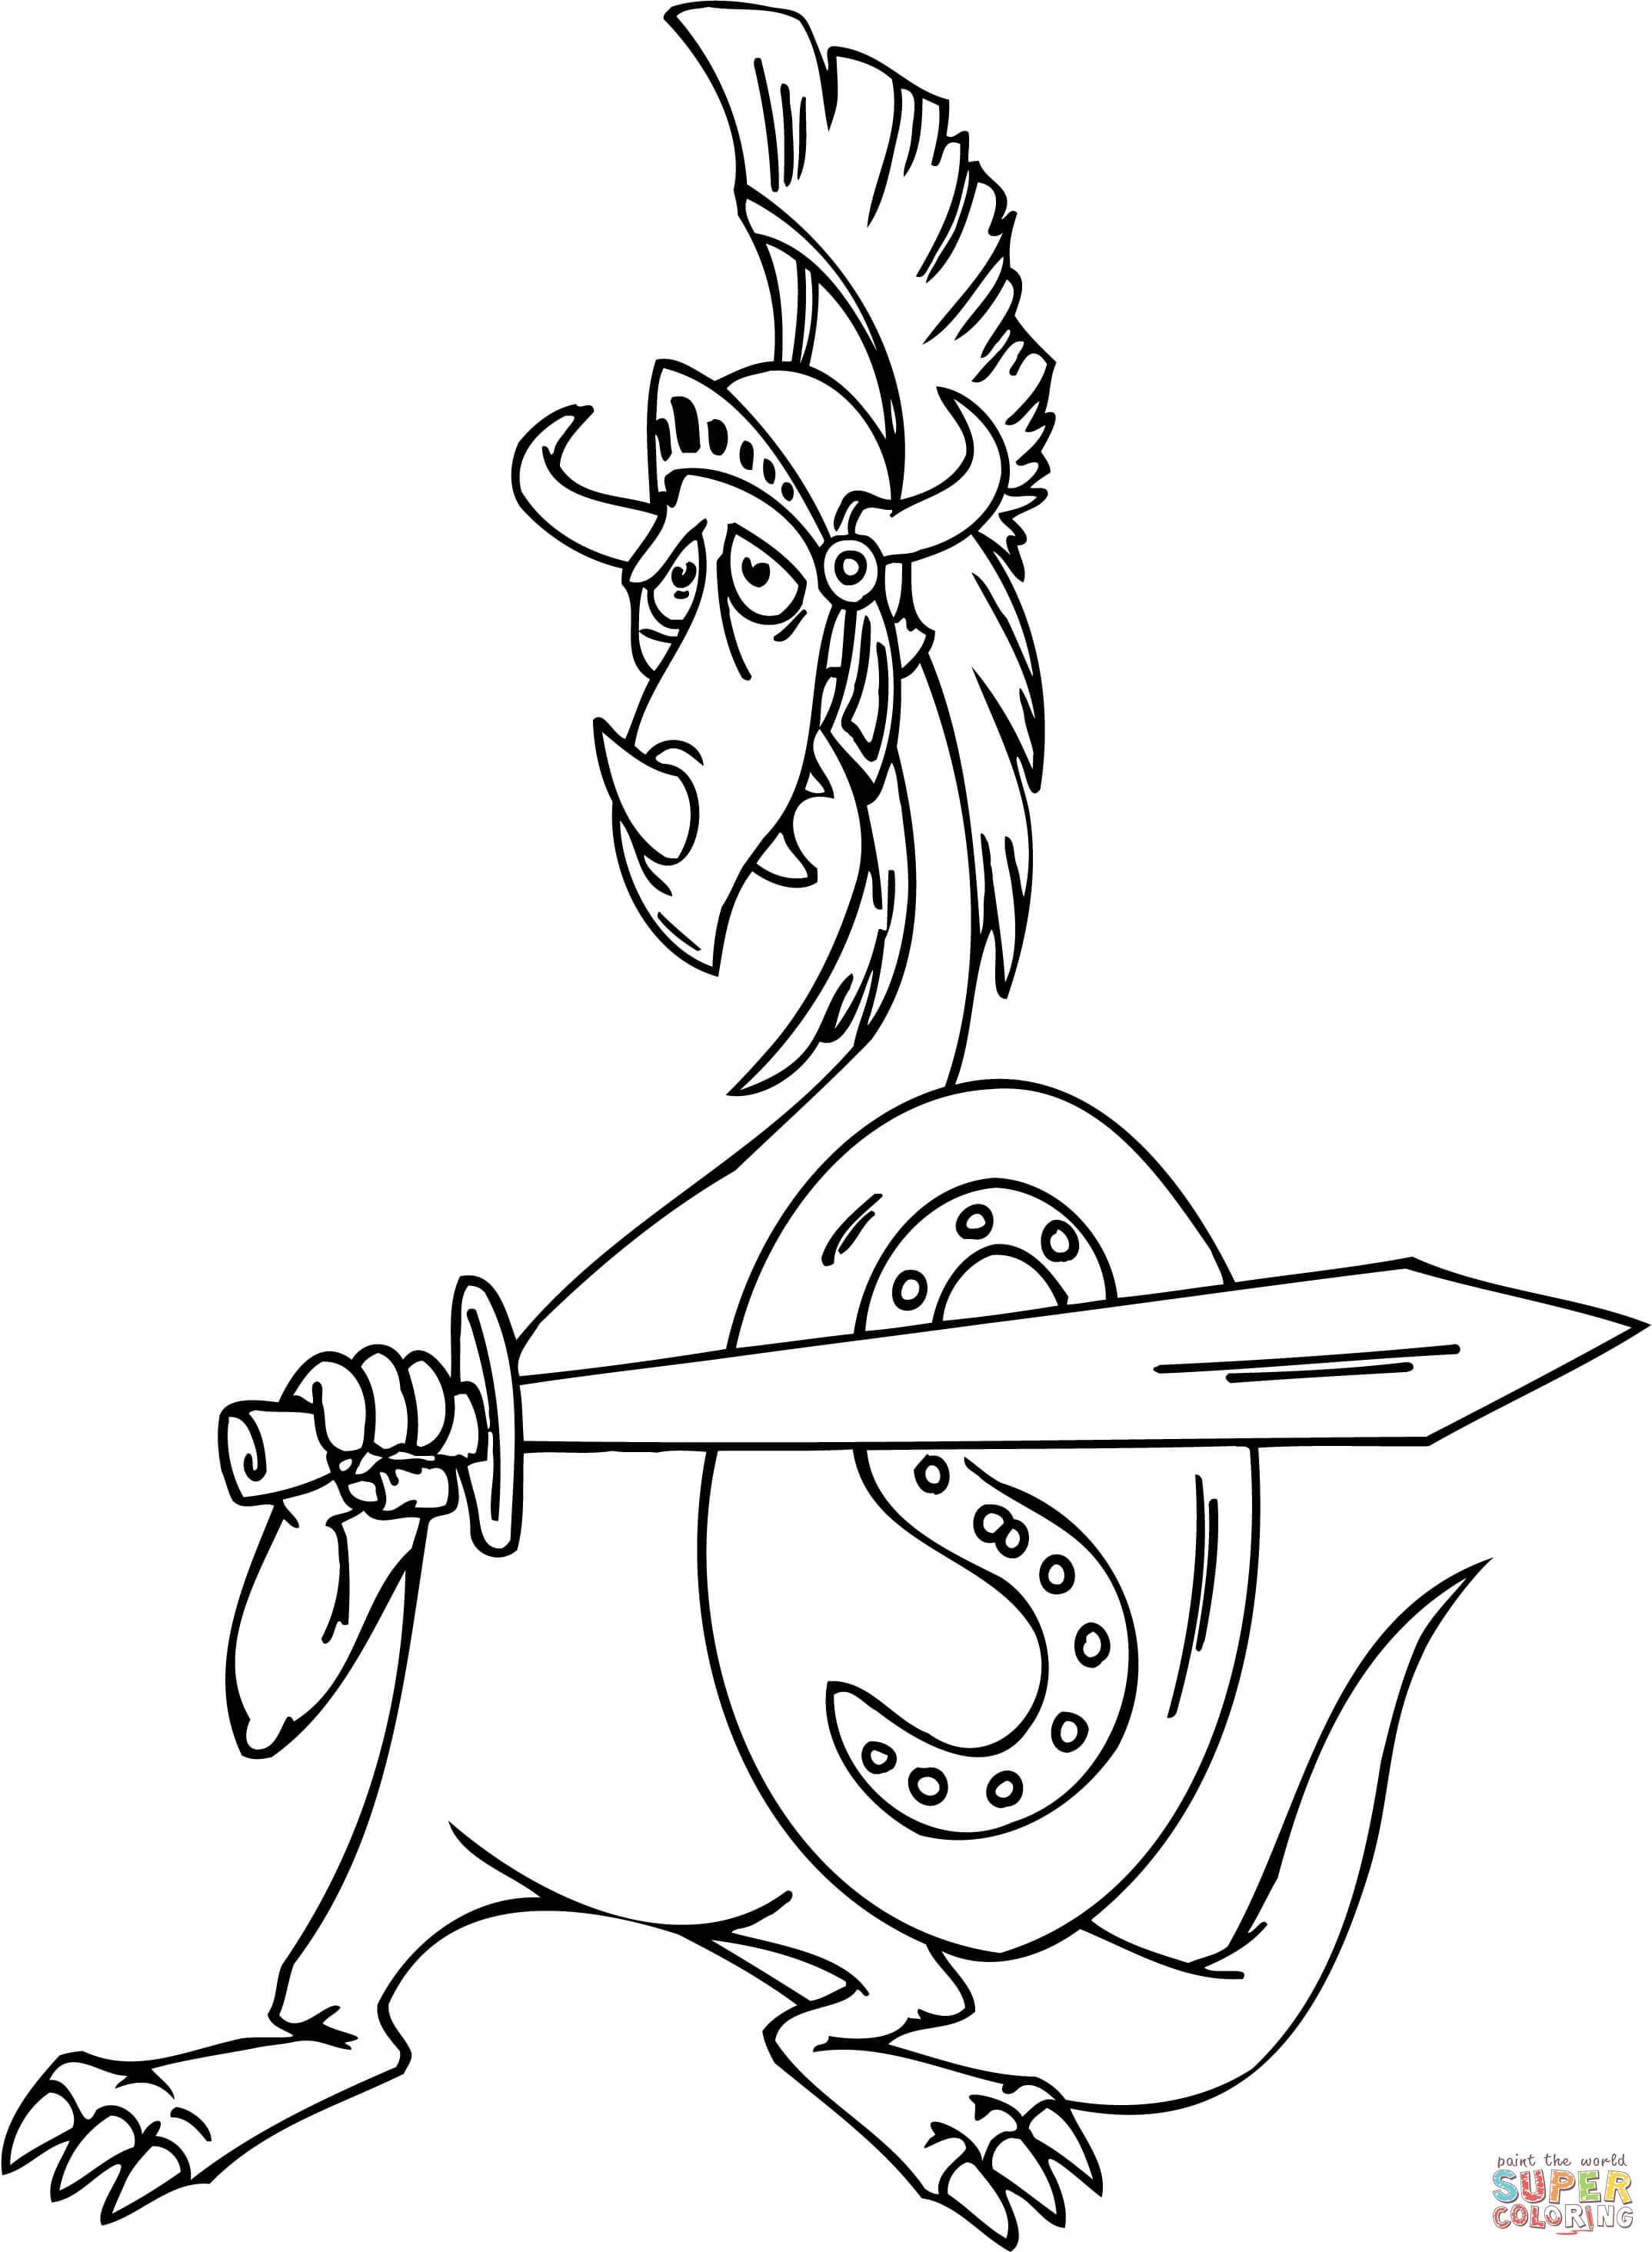 Gladiator coloring #2, Download drawings